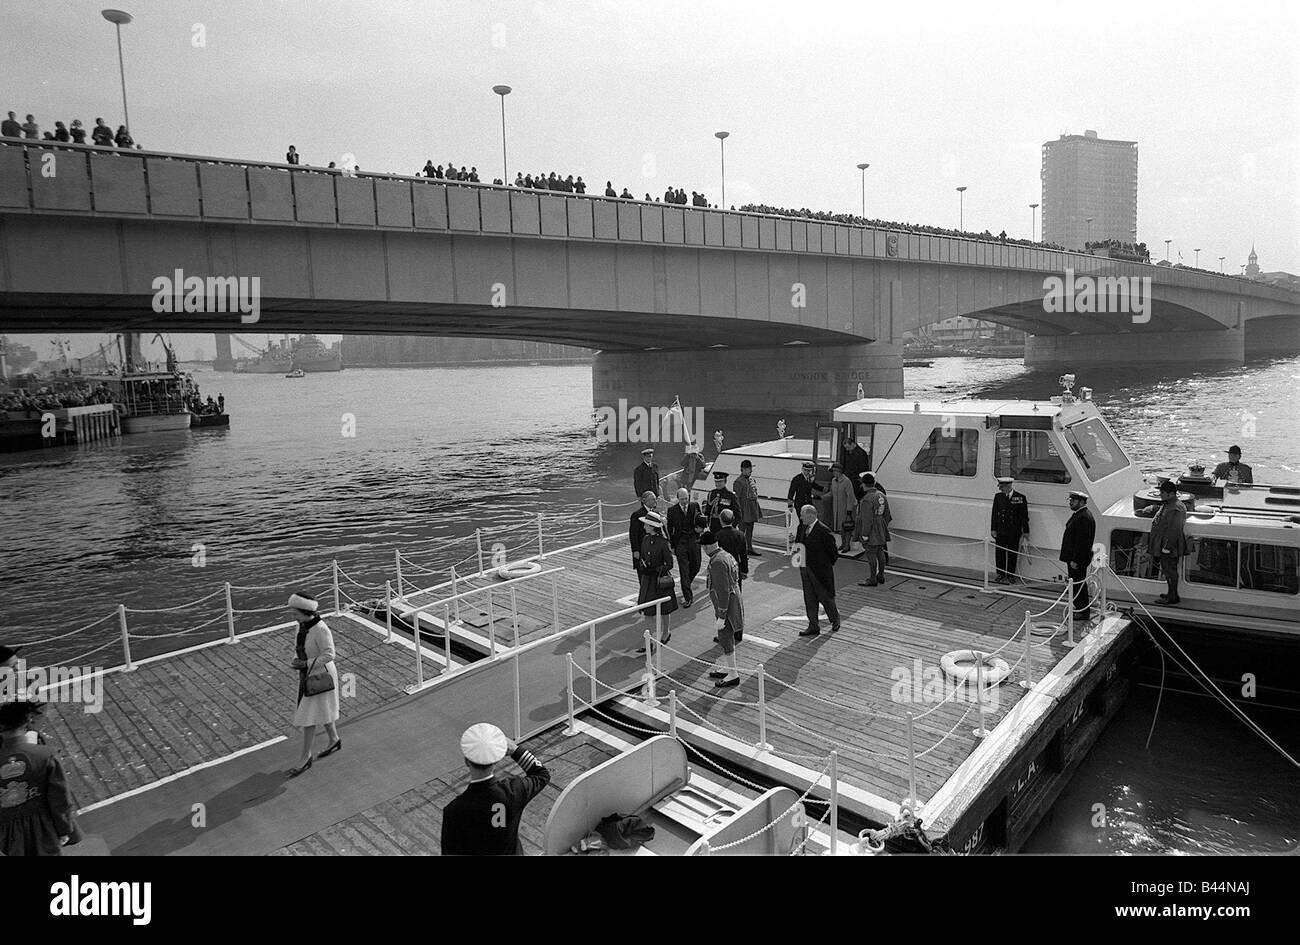 Queen Elizabeth II March 1973 Opening of new London Bridge The Queen arrives at Fishmongers Quay - Stock Image